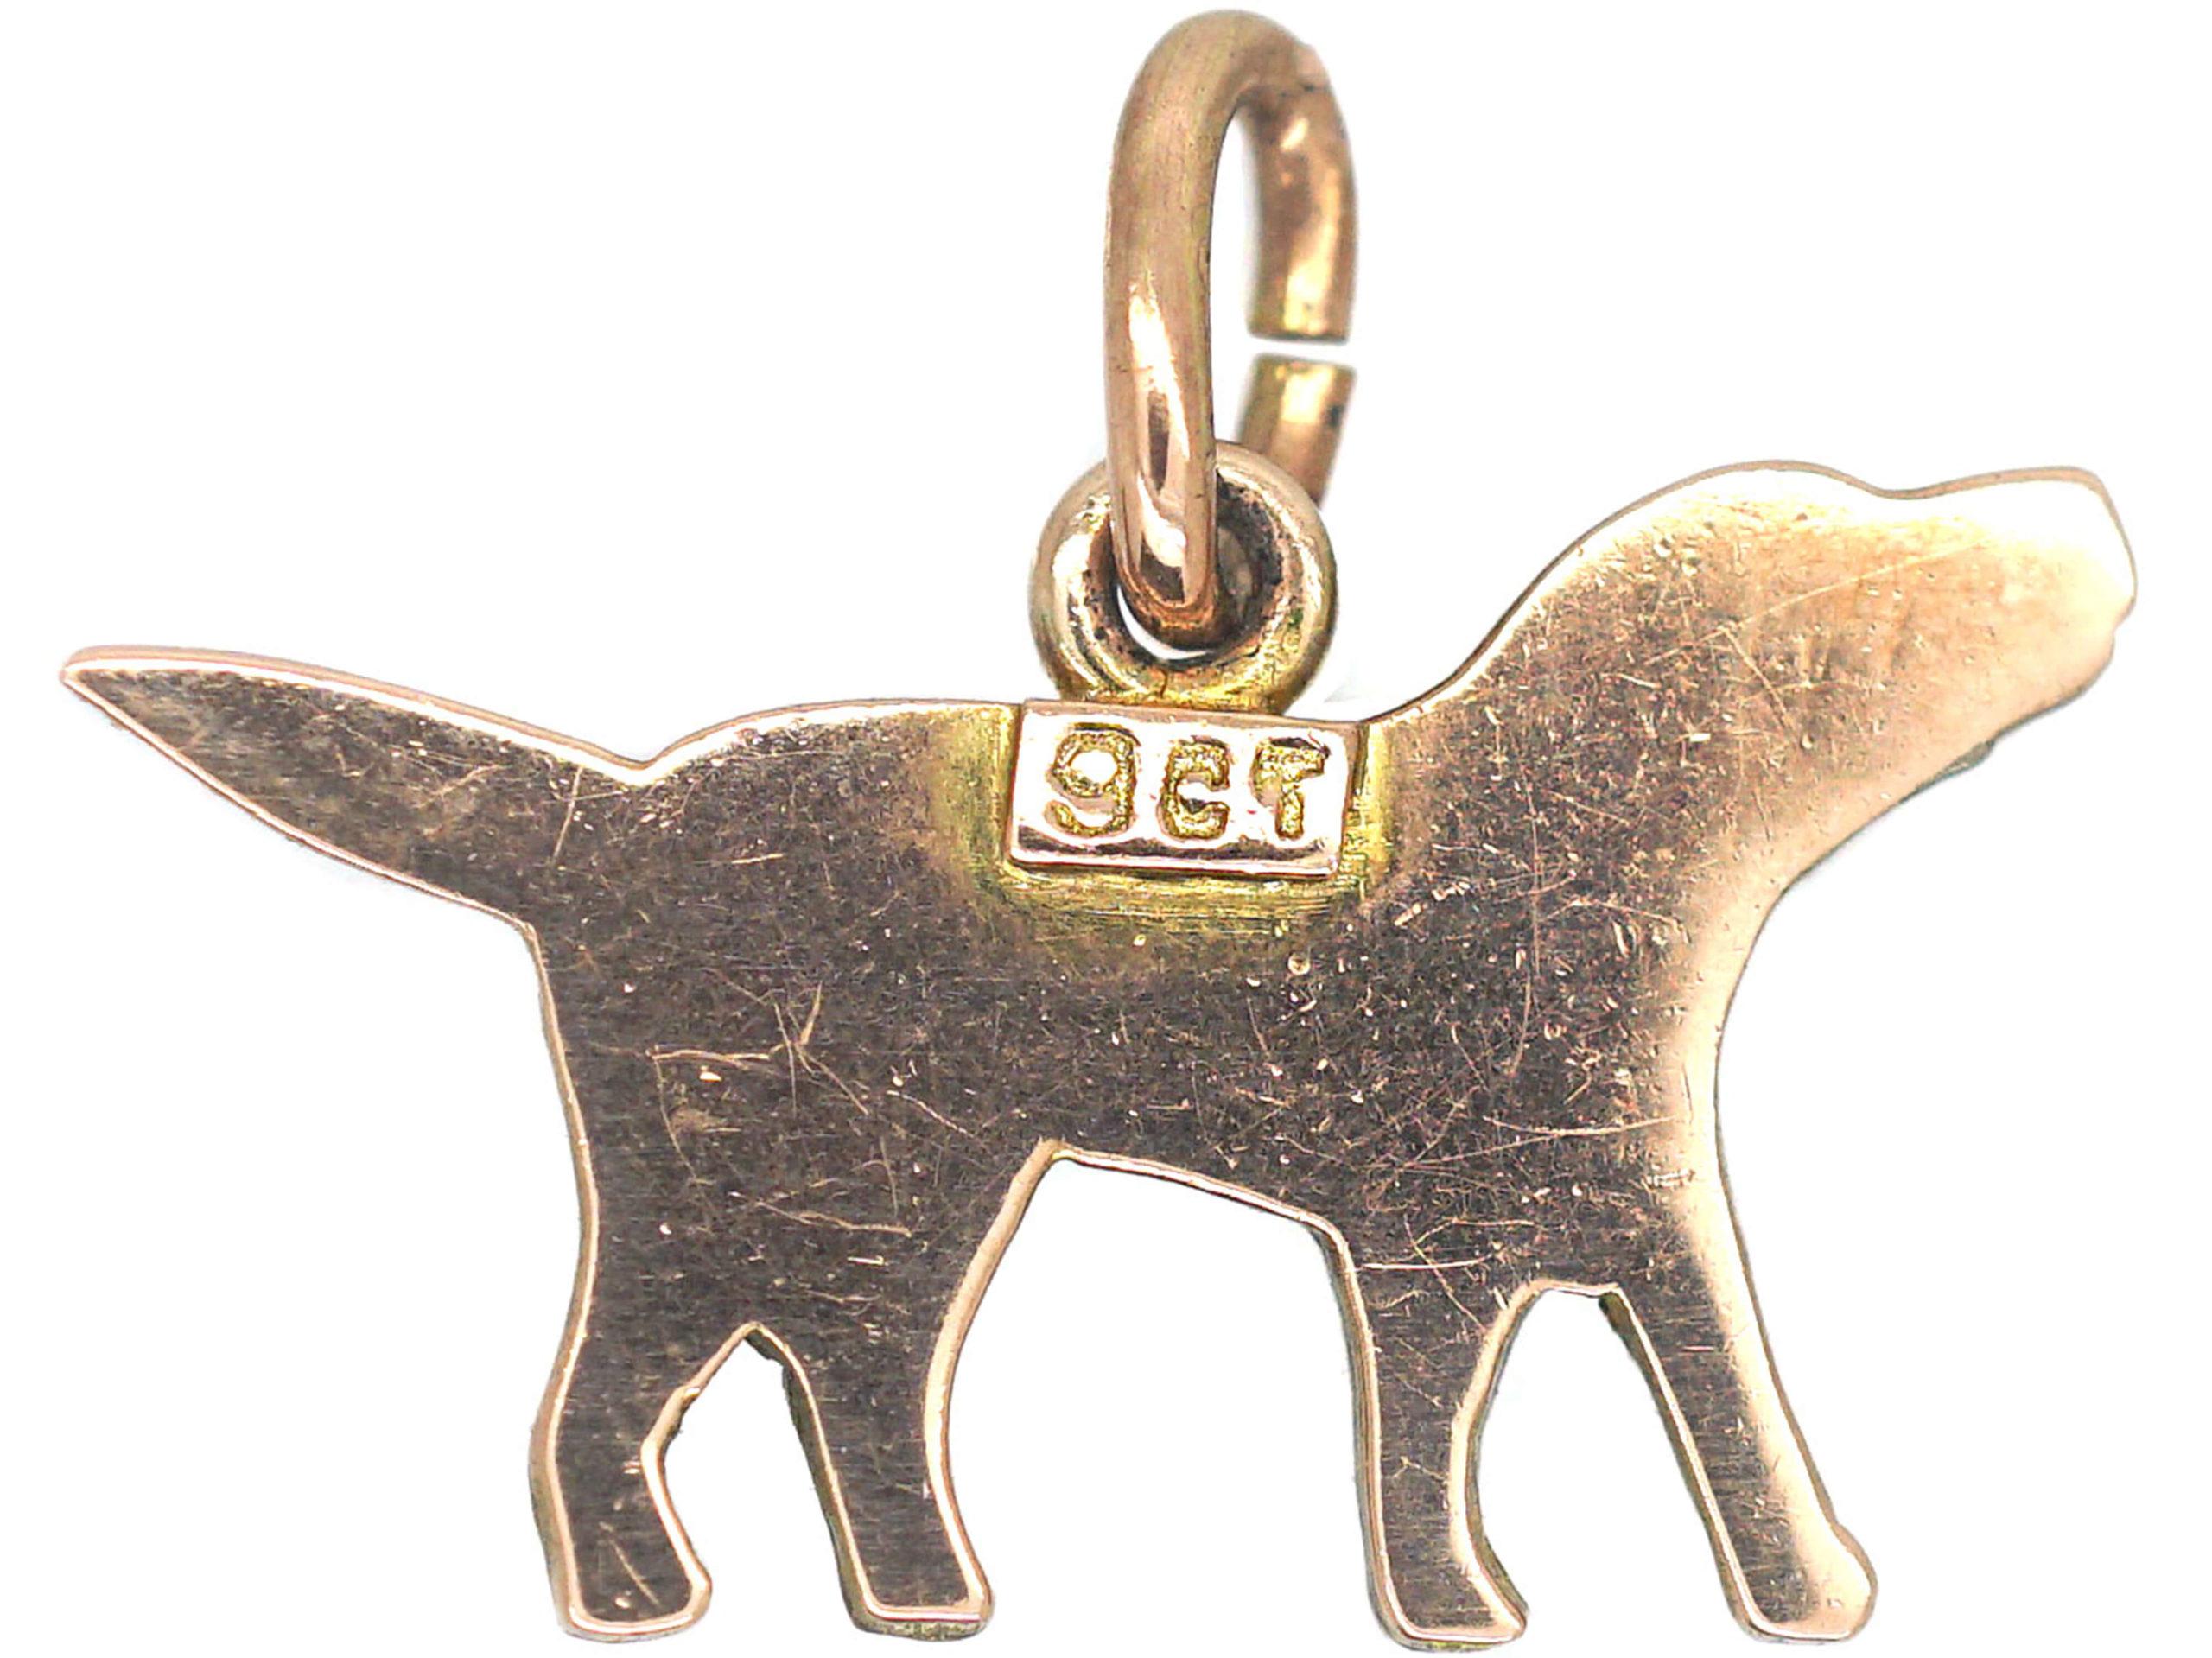 Edwardian 9ct Gold Spaniel Charm